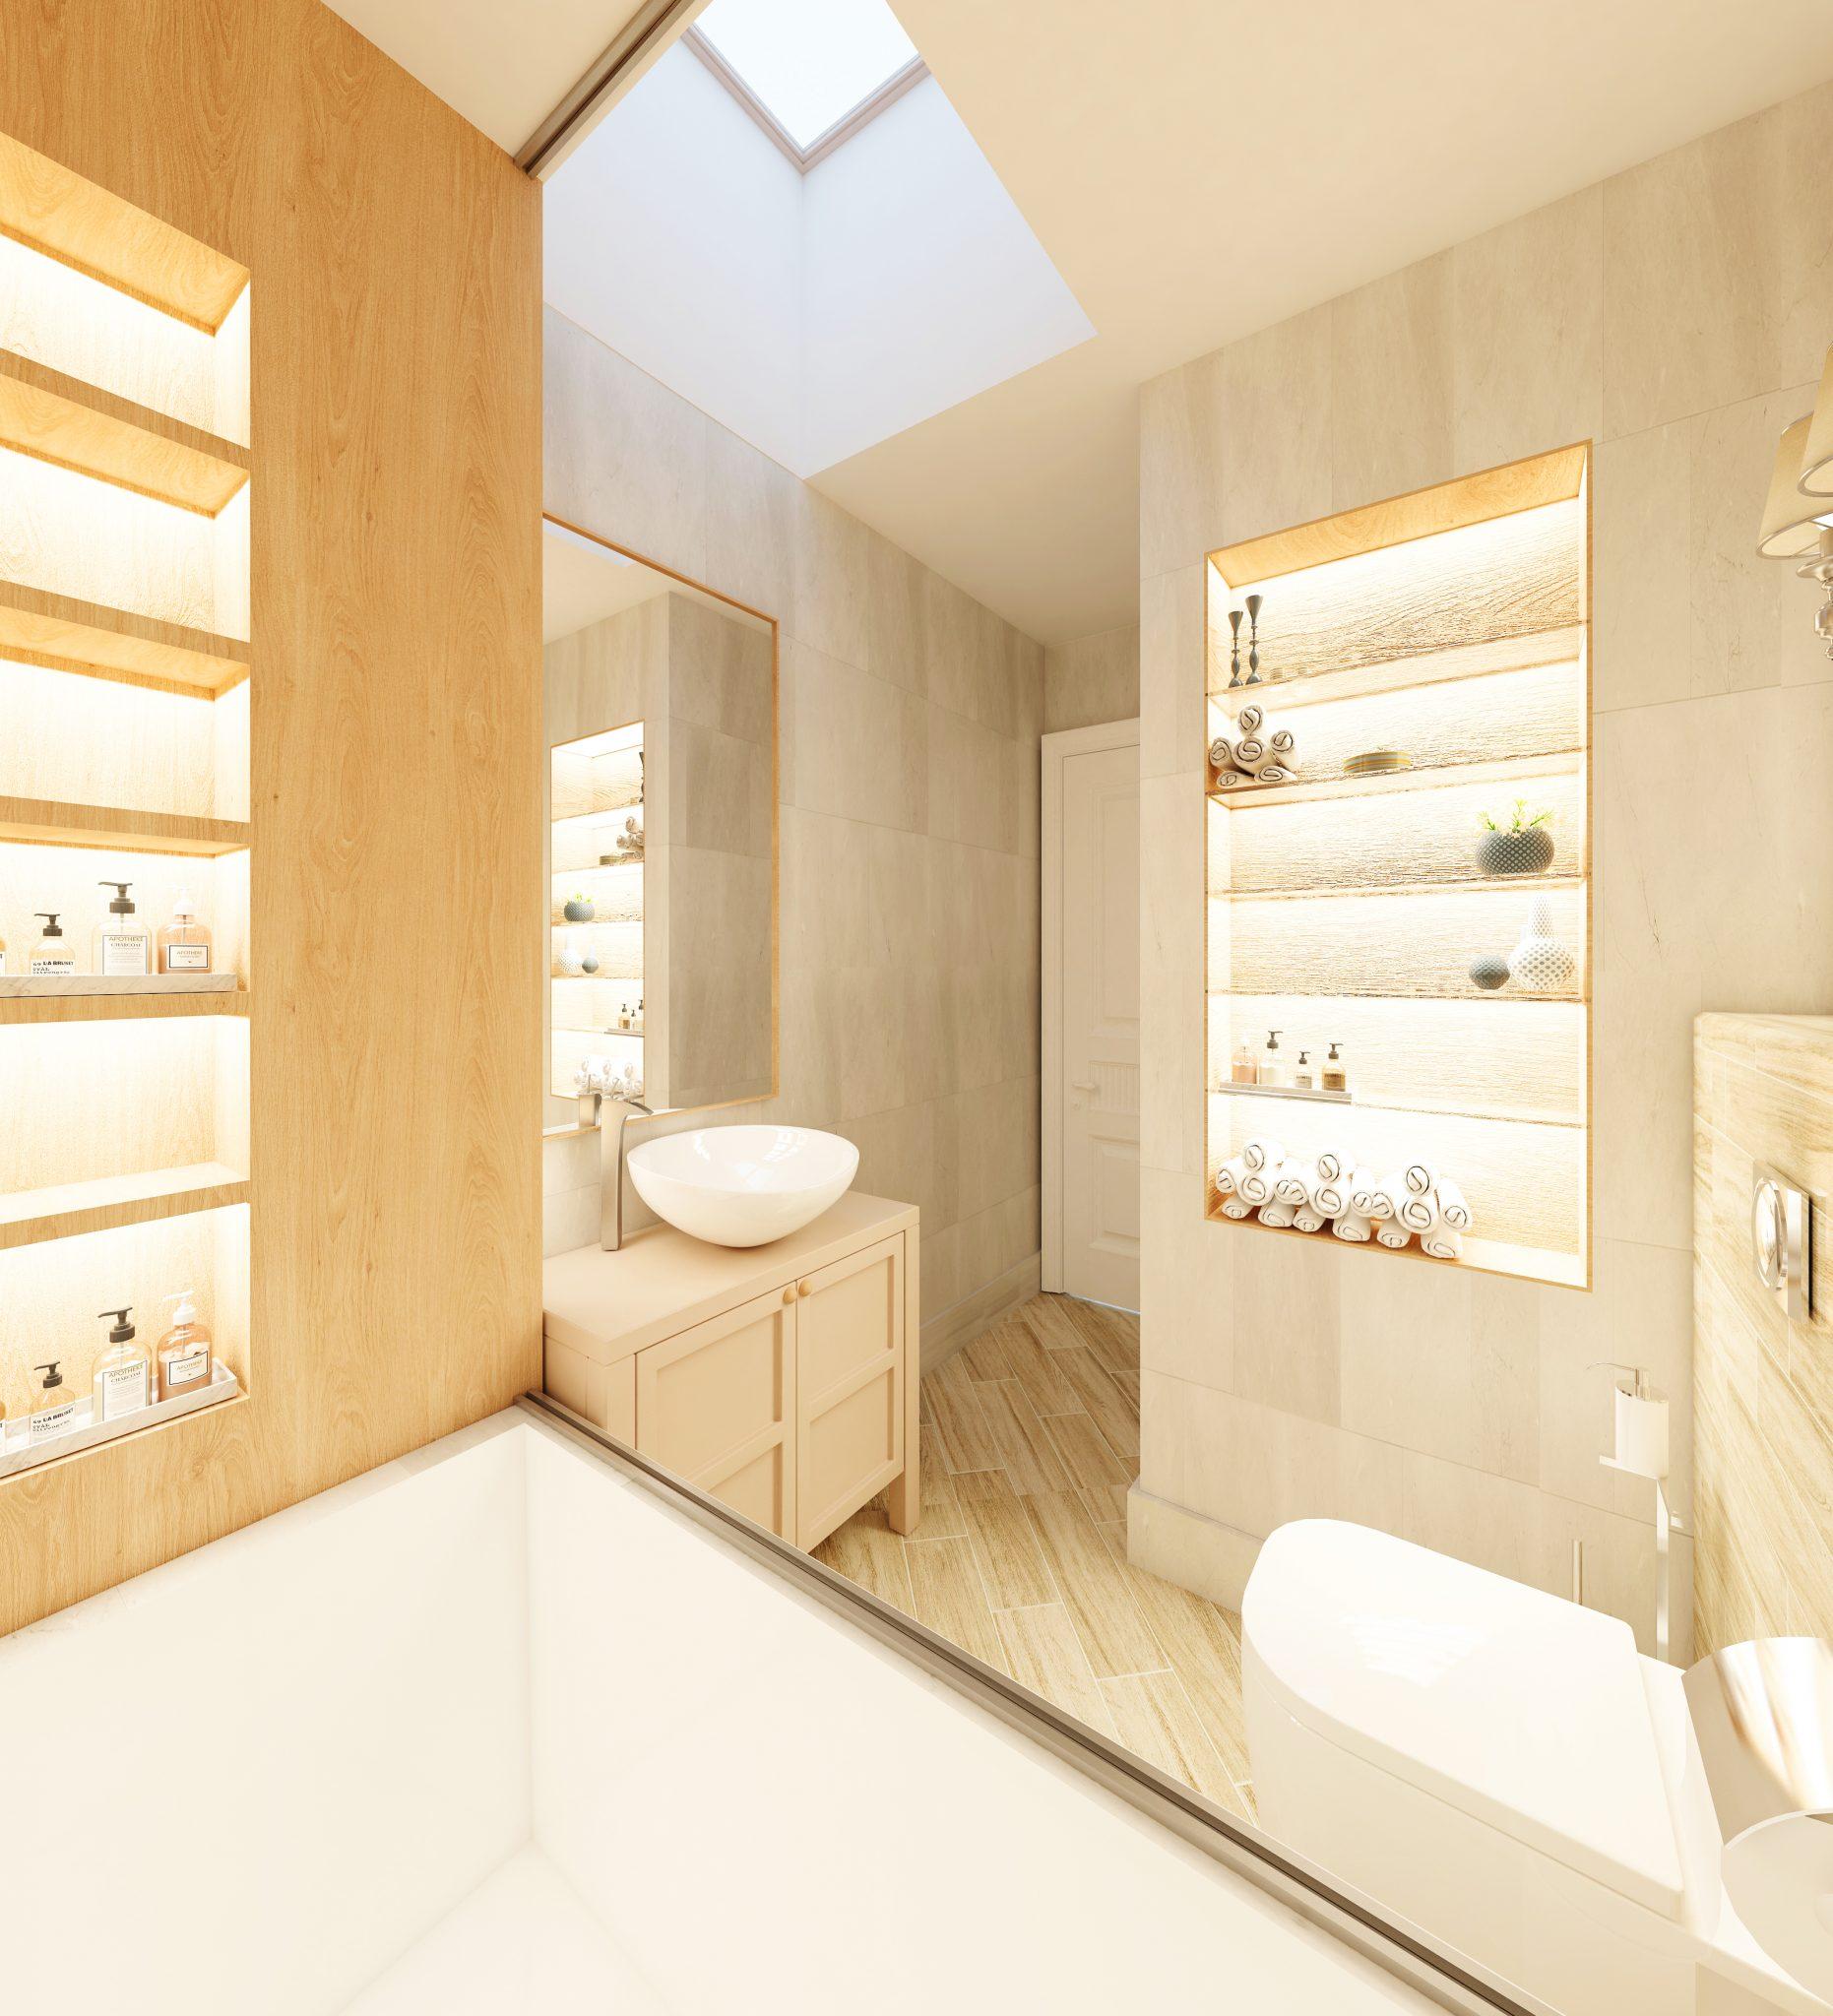 466-Bathroom Visualisation v1